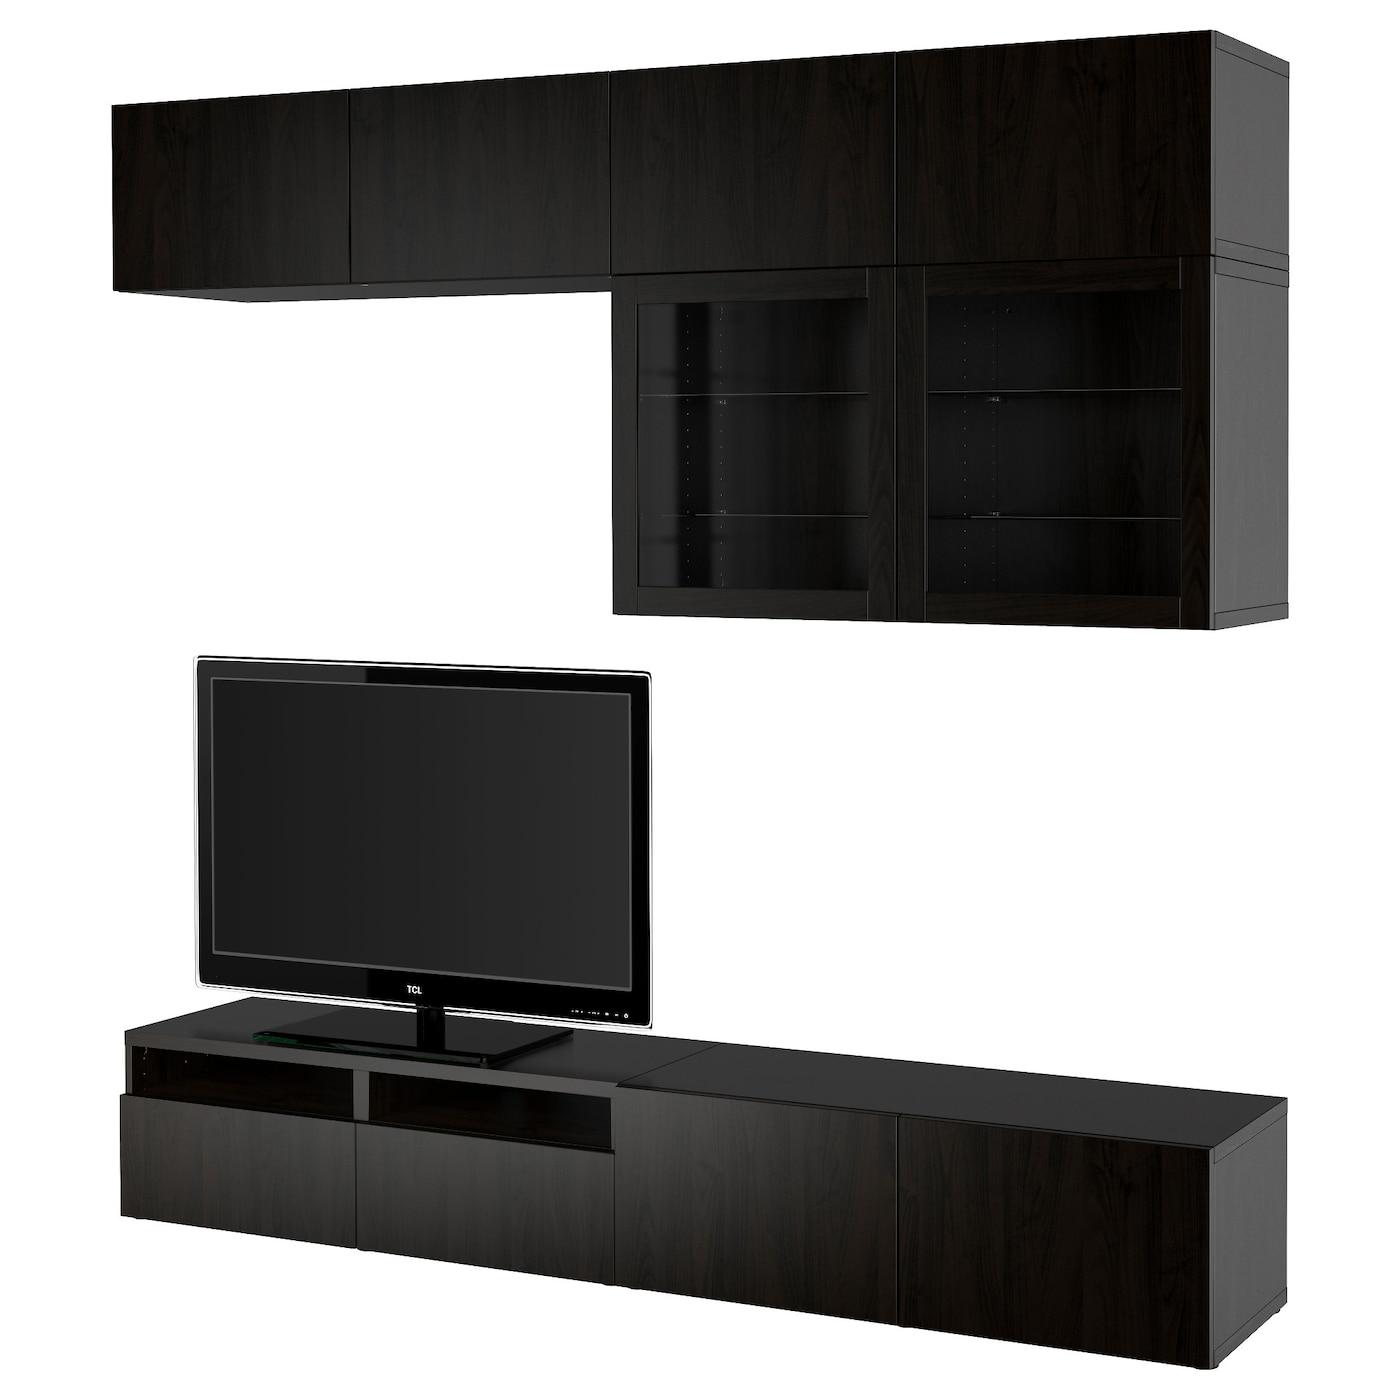 Best Combinaison Rangt Tv Vitrines Lappviken Sindvik Brun Noir  # Petit Meuble Tv Transparent